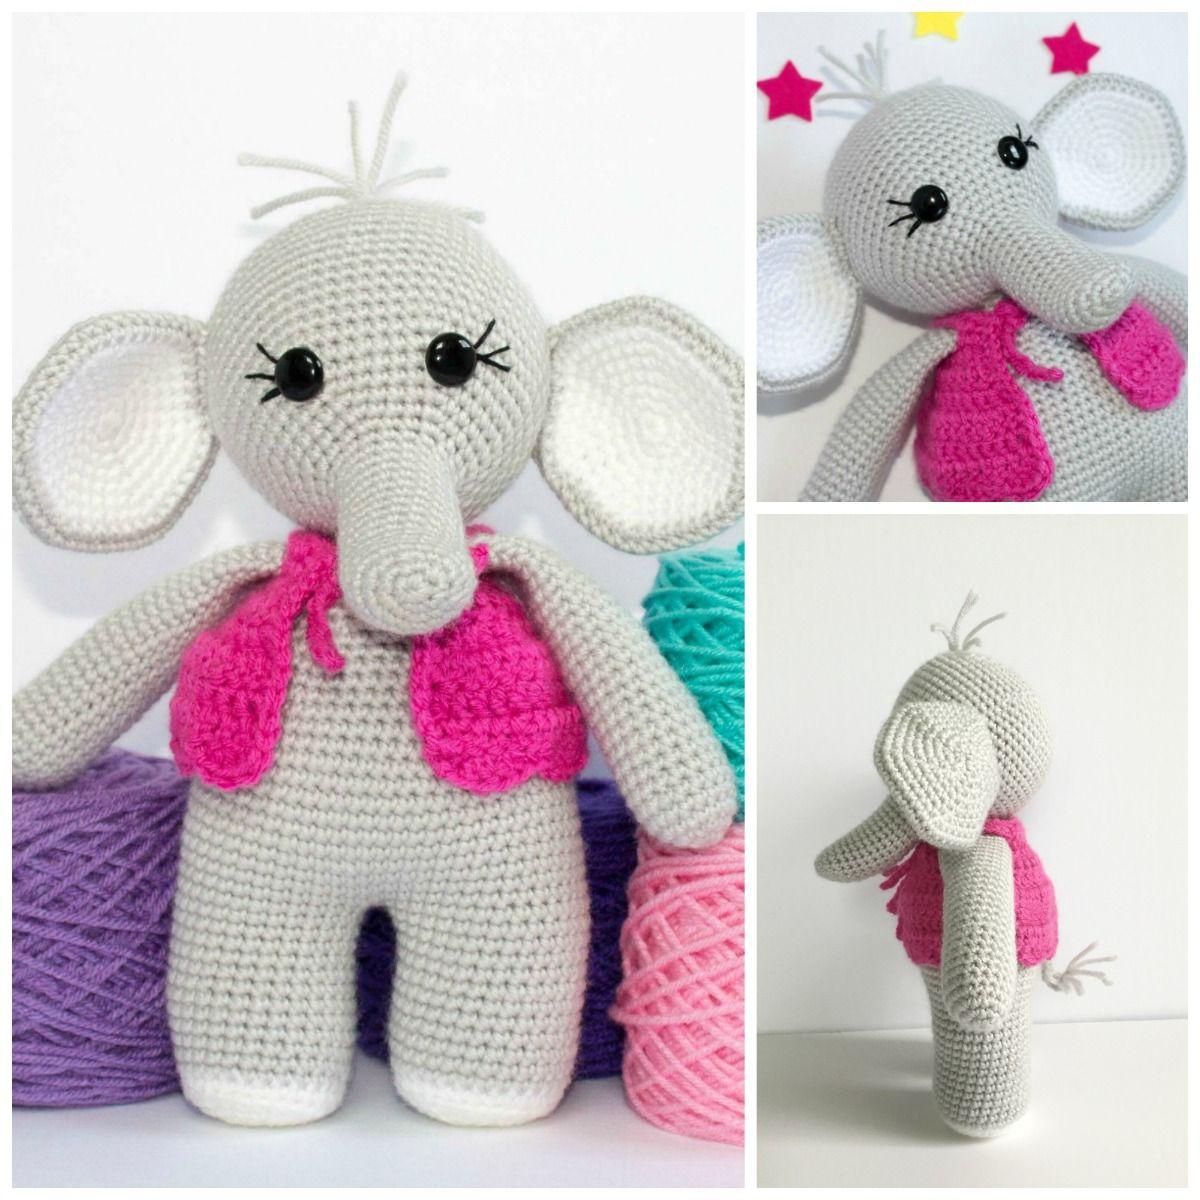 The Friendly Elephant Crochet A Long